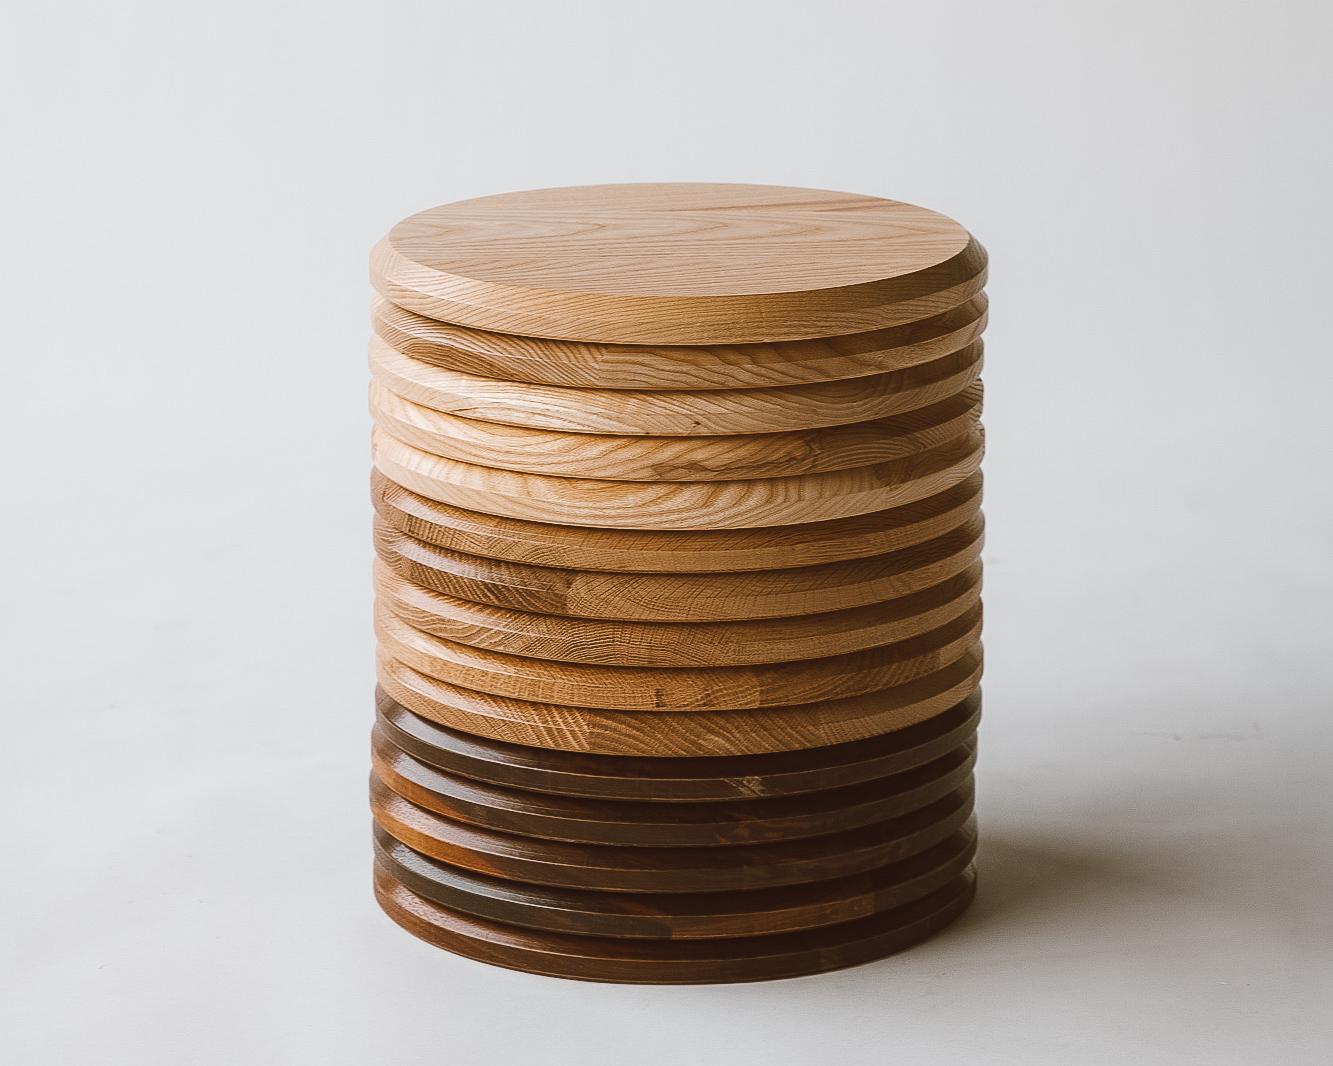 forthehome-edgework-creative-stools01.jpg